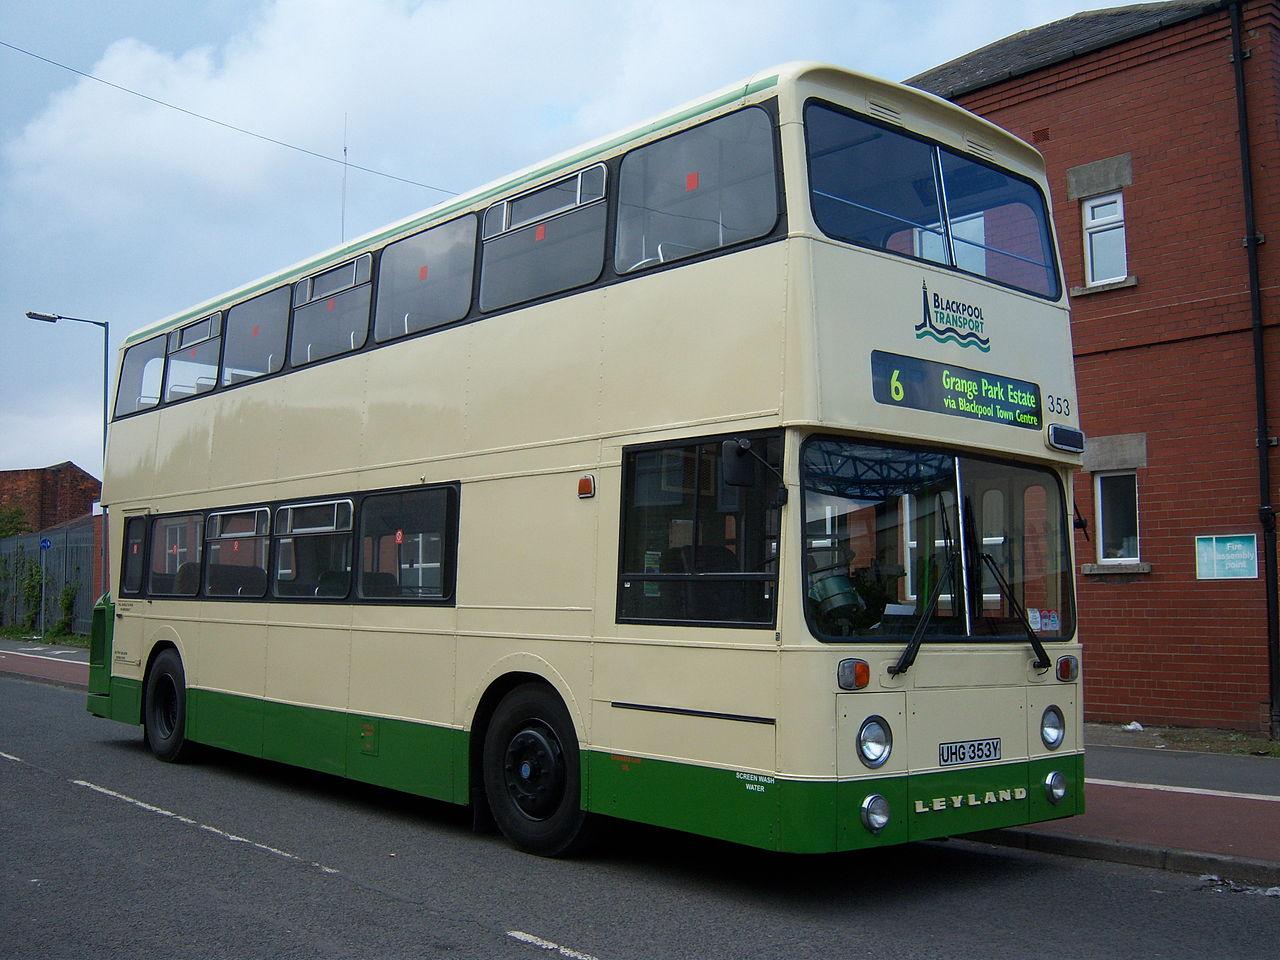 File:Preserved Blackpool Transport bus 353 (UHG 353Y) 1982 Leyland ...